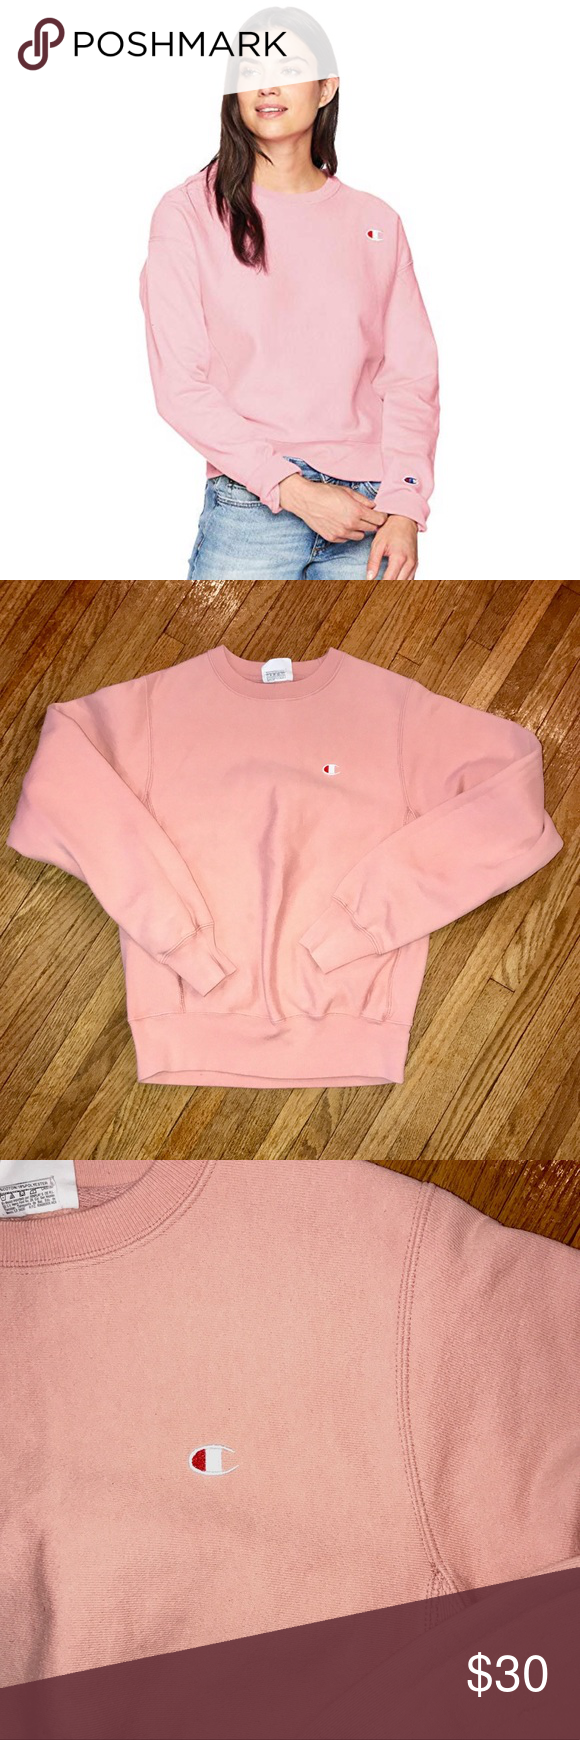 Champion Women S Crew Neck Champions Women S Crew Neck In Pink Candy Great Condition Champion Tops Sweatshirts Hoodies Champion Tops Women Clothes Design [ 1740 x 580 Pixel ]